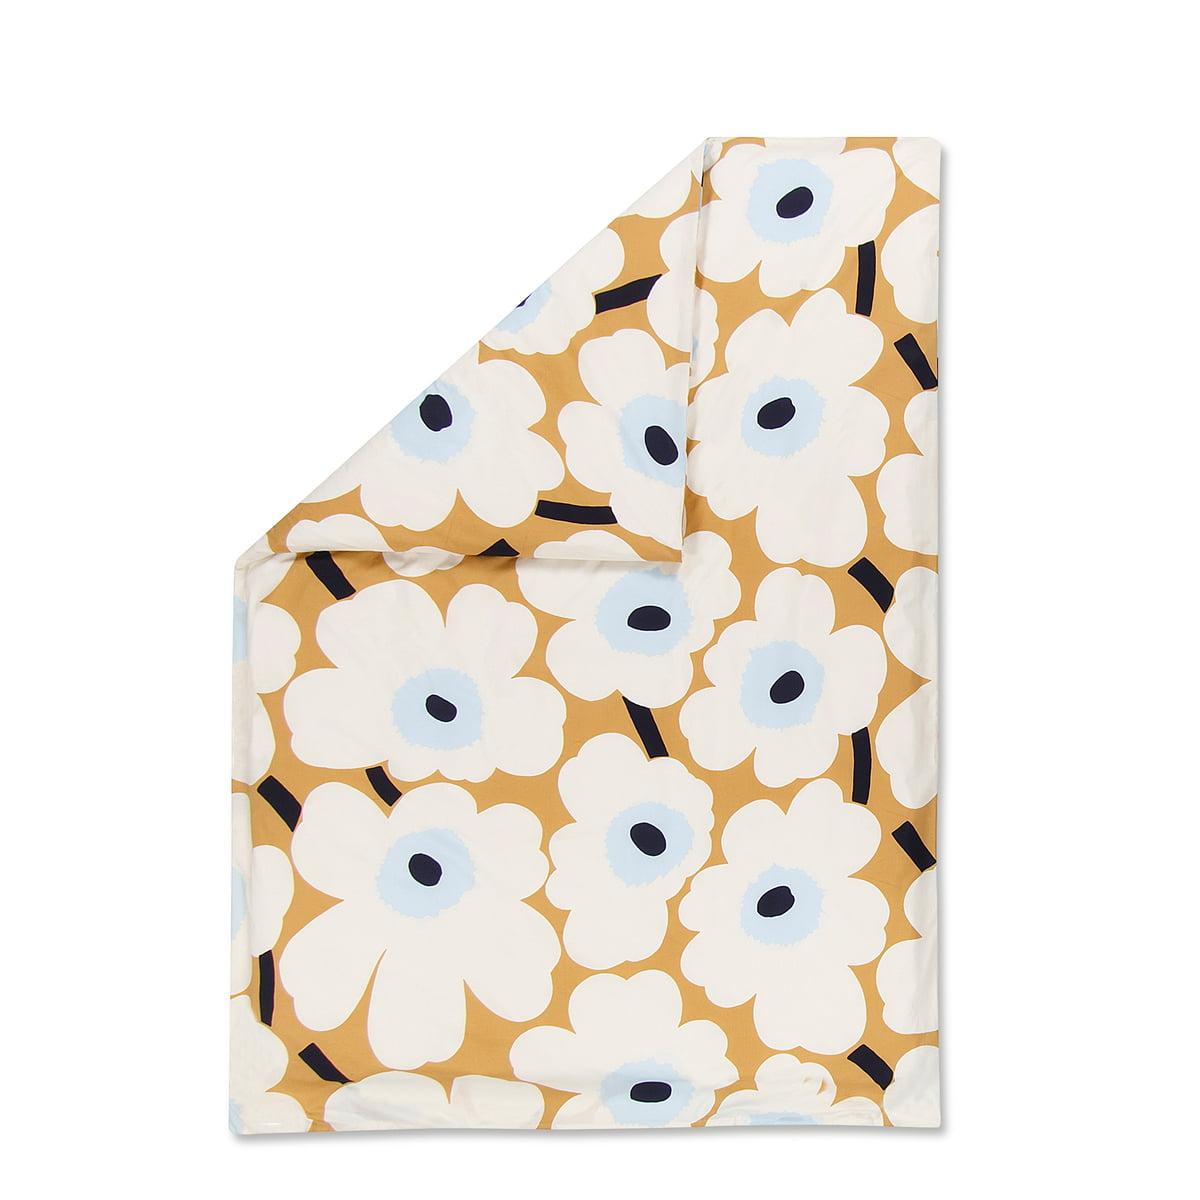 Unikko Duvet Cover By Marimekko In The Shop